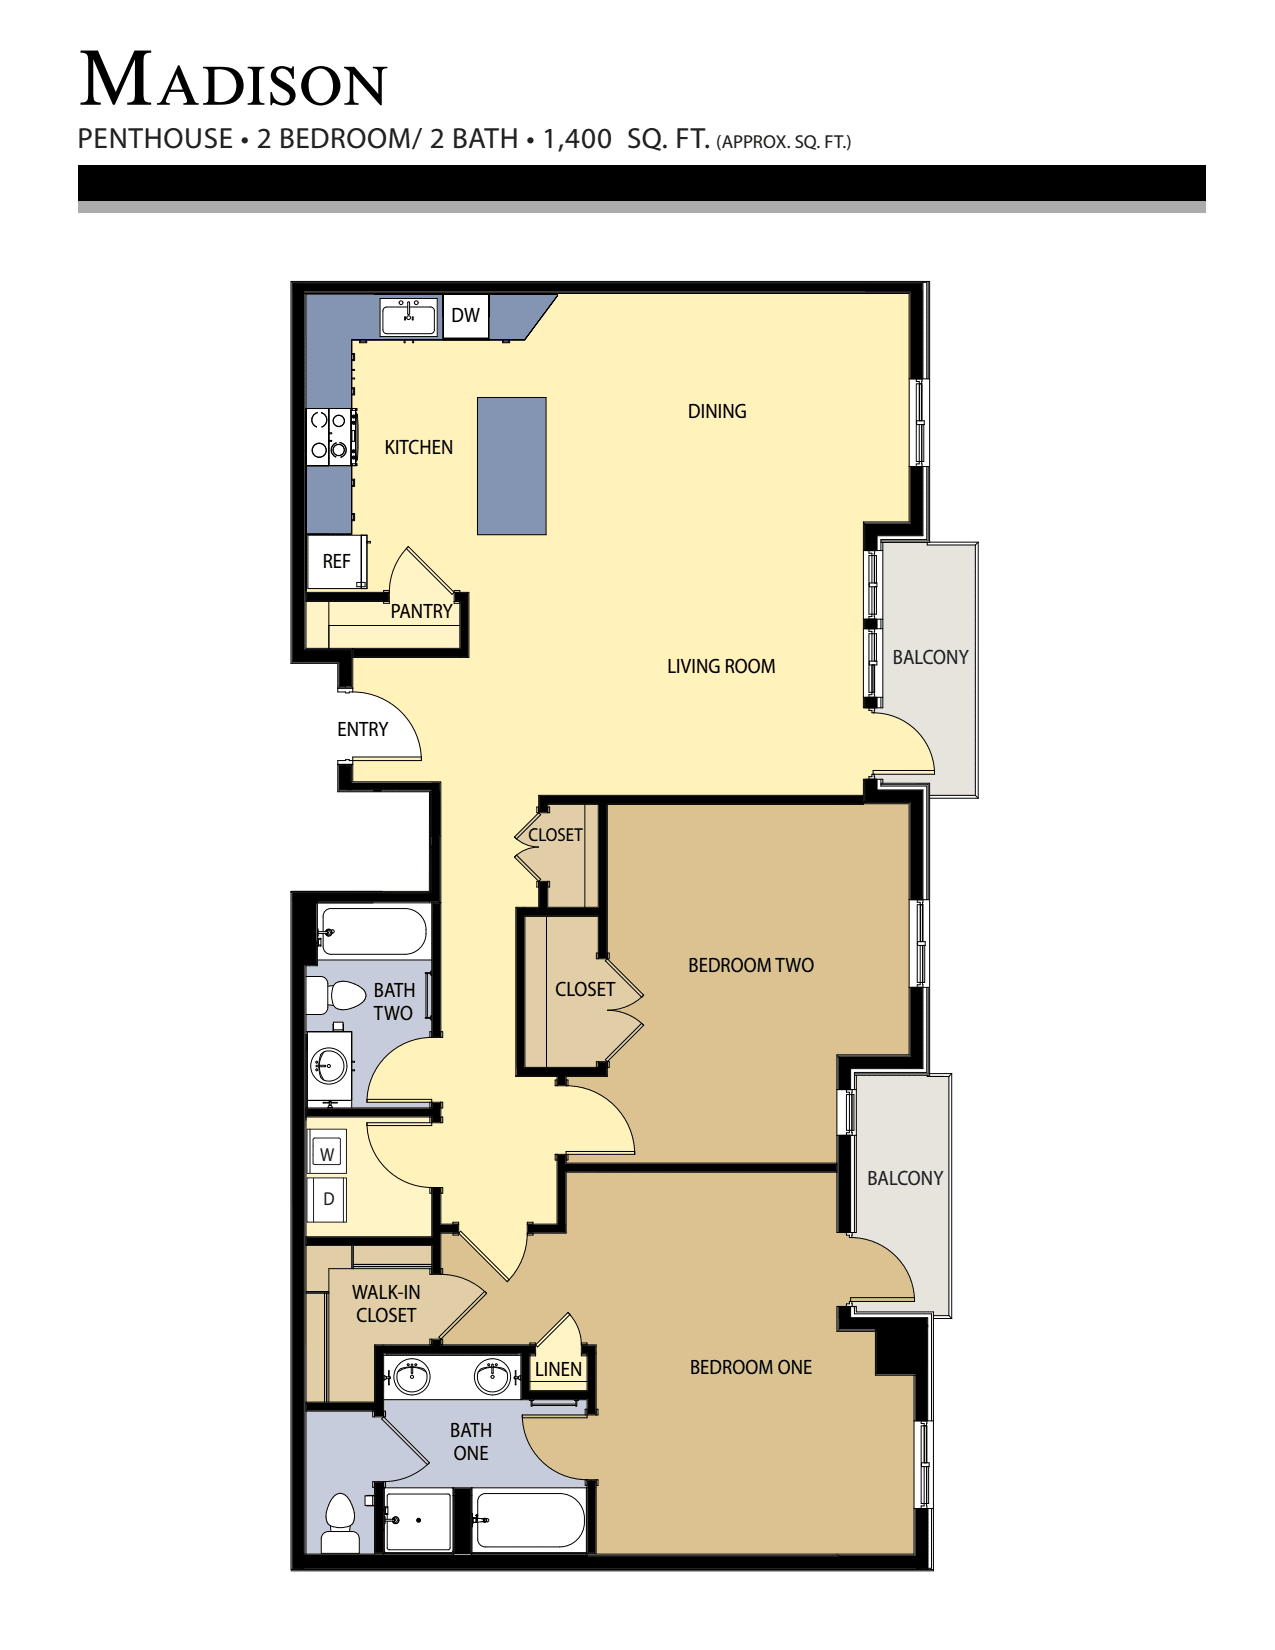 Madison floor plan - 2 Bed / 2 Bath (1,400 Sq Ft)